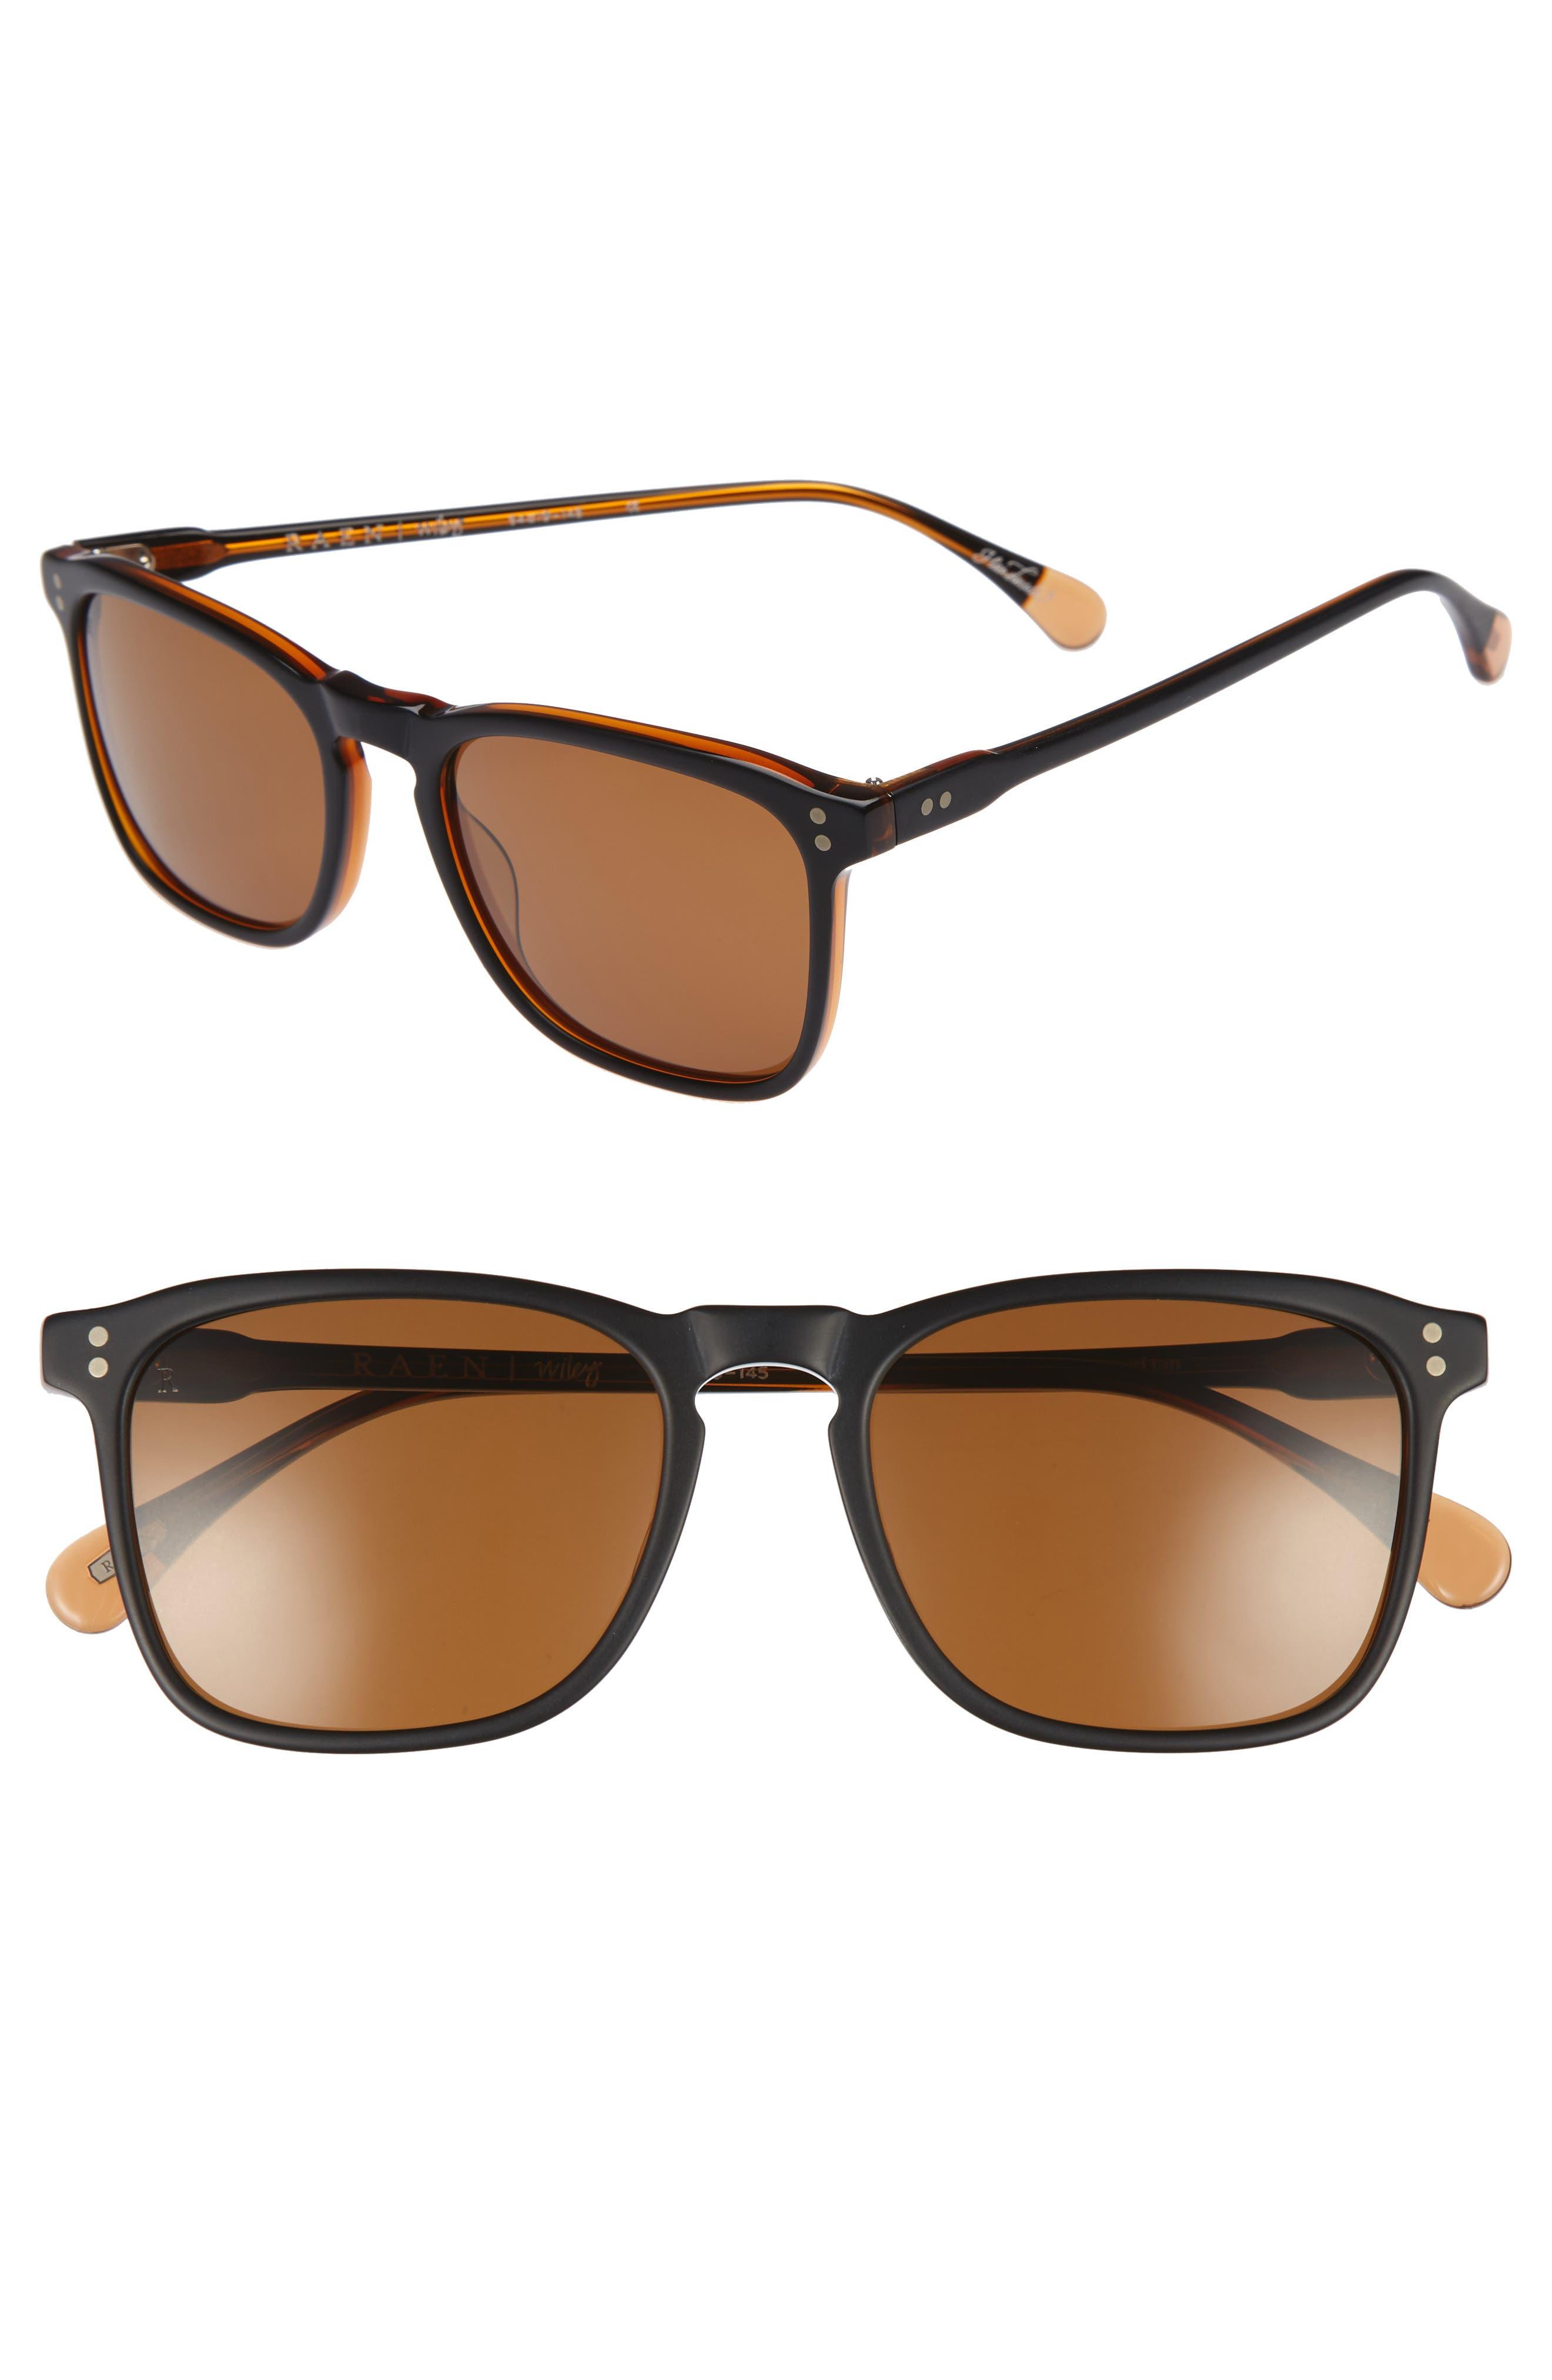 Main Image - Raen Wiley 54mm Polarized Sunglasses